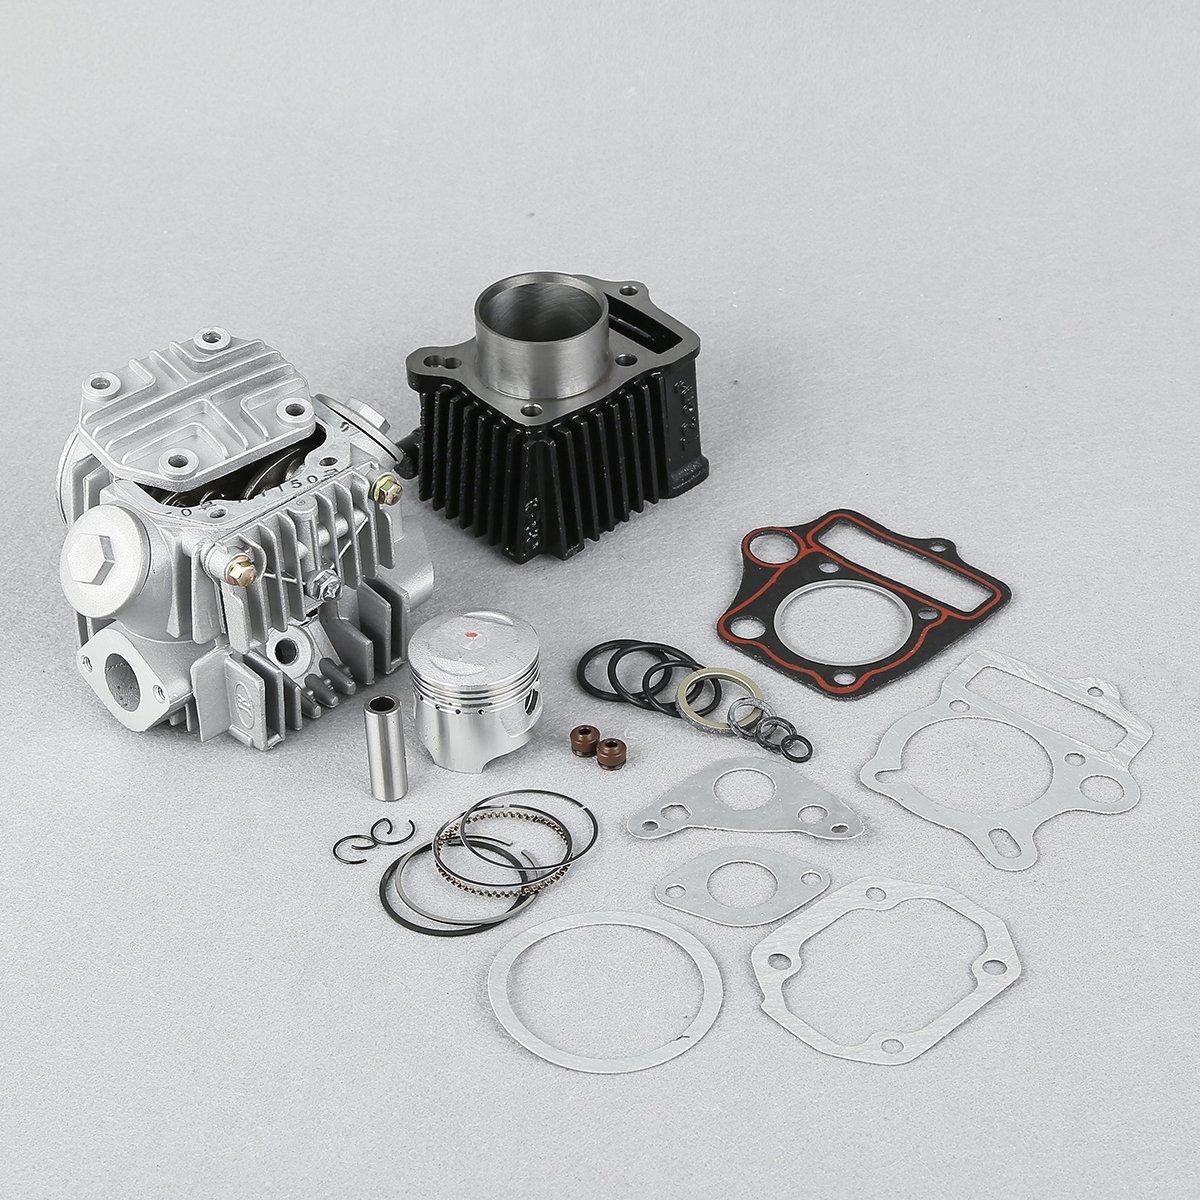 Xfmt 70cc Engine Cylinder Rebuild Kit For Honda Atc70 1970 Ct70 Spark Plug Crf70 Trx70 Xr70 495cm3 Automotive